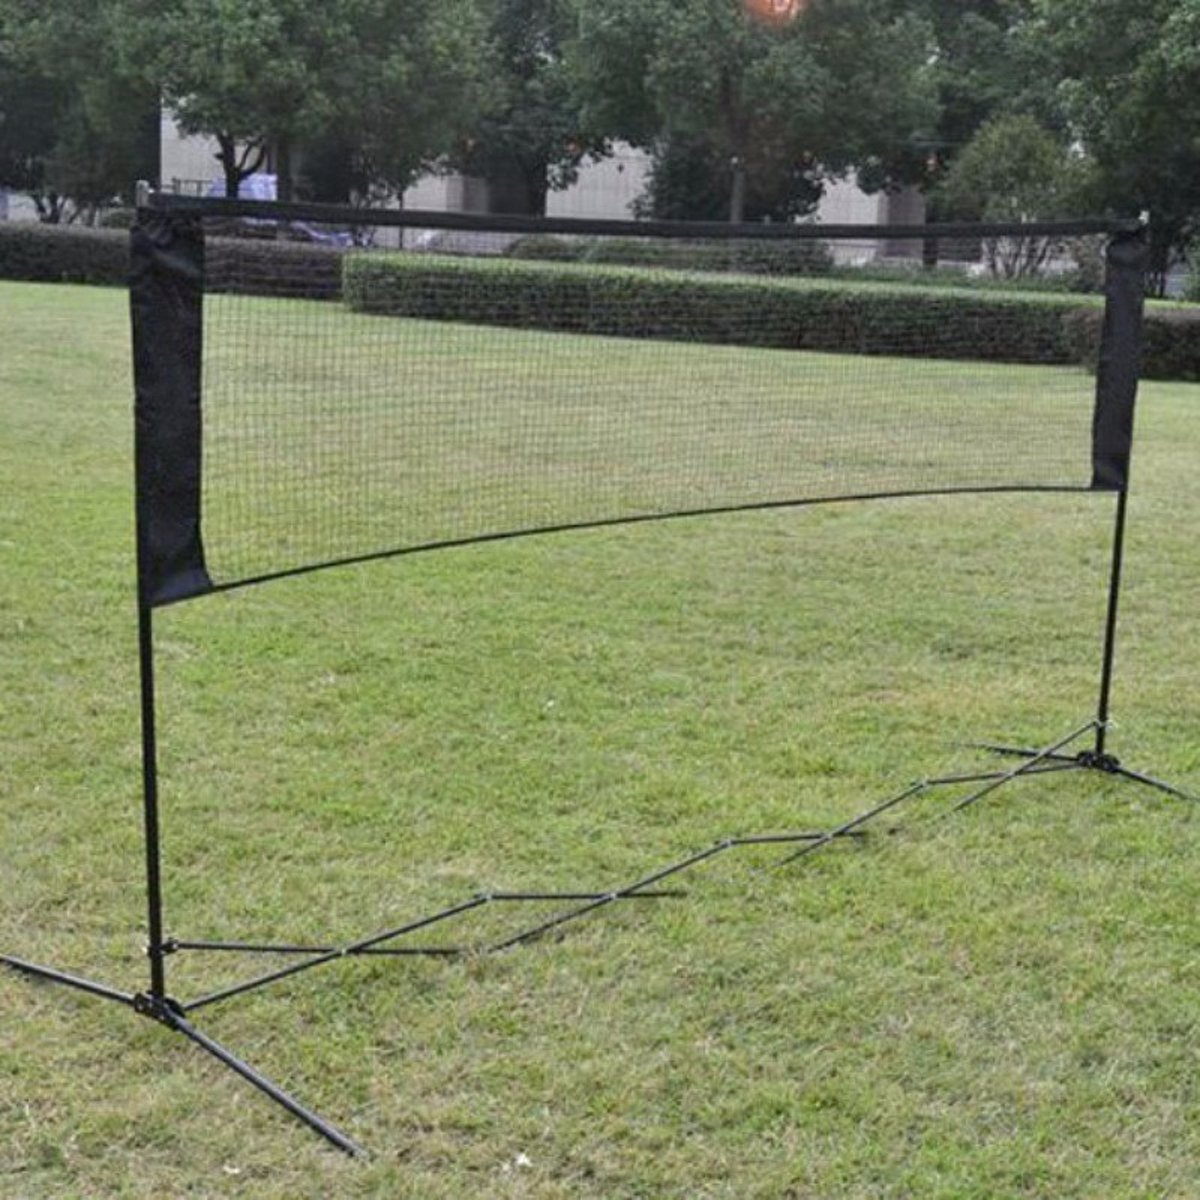 Badminton net 5,9m x 0,8m